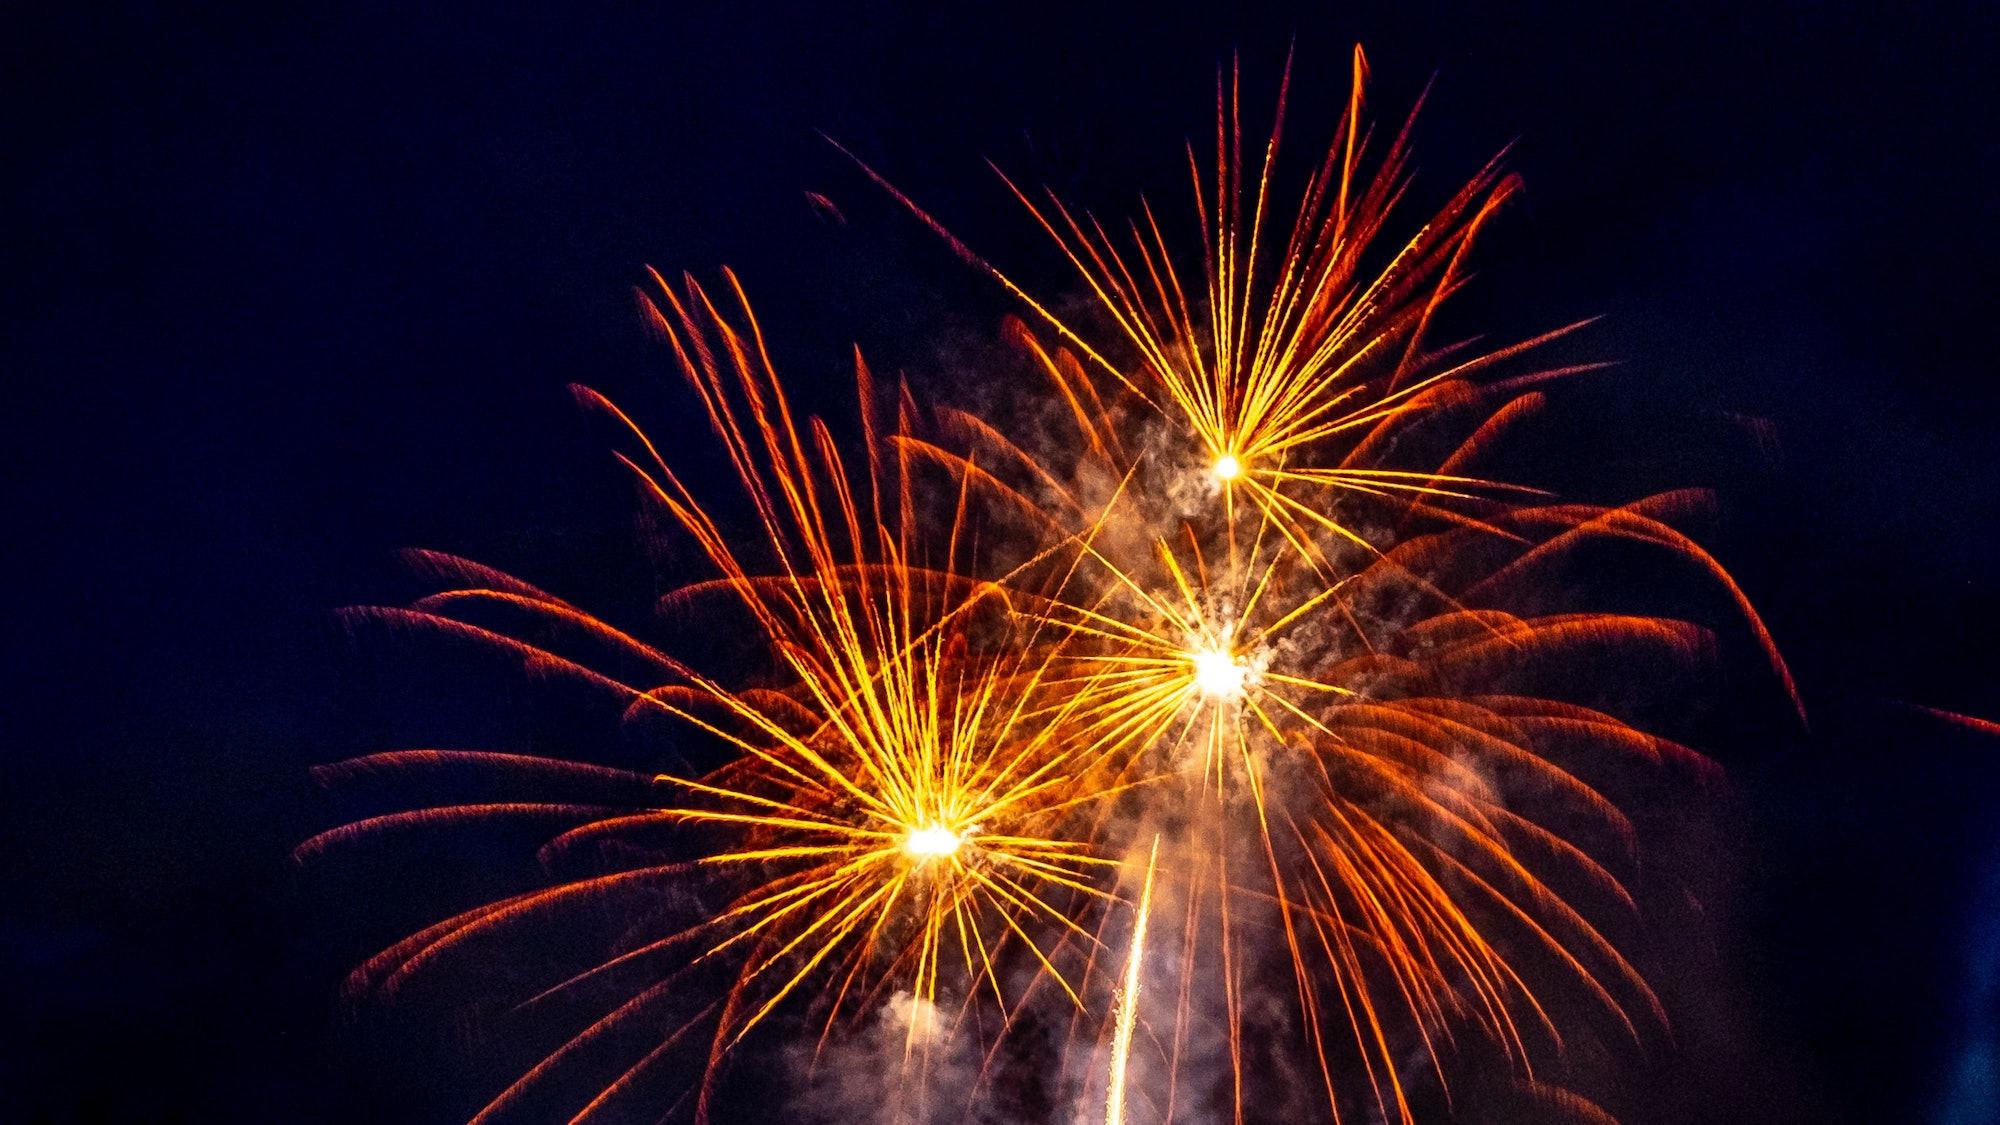 Bonfire Night fireworks displays in Leeds